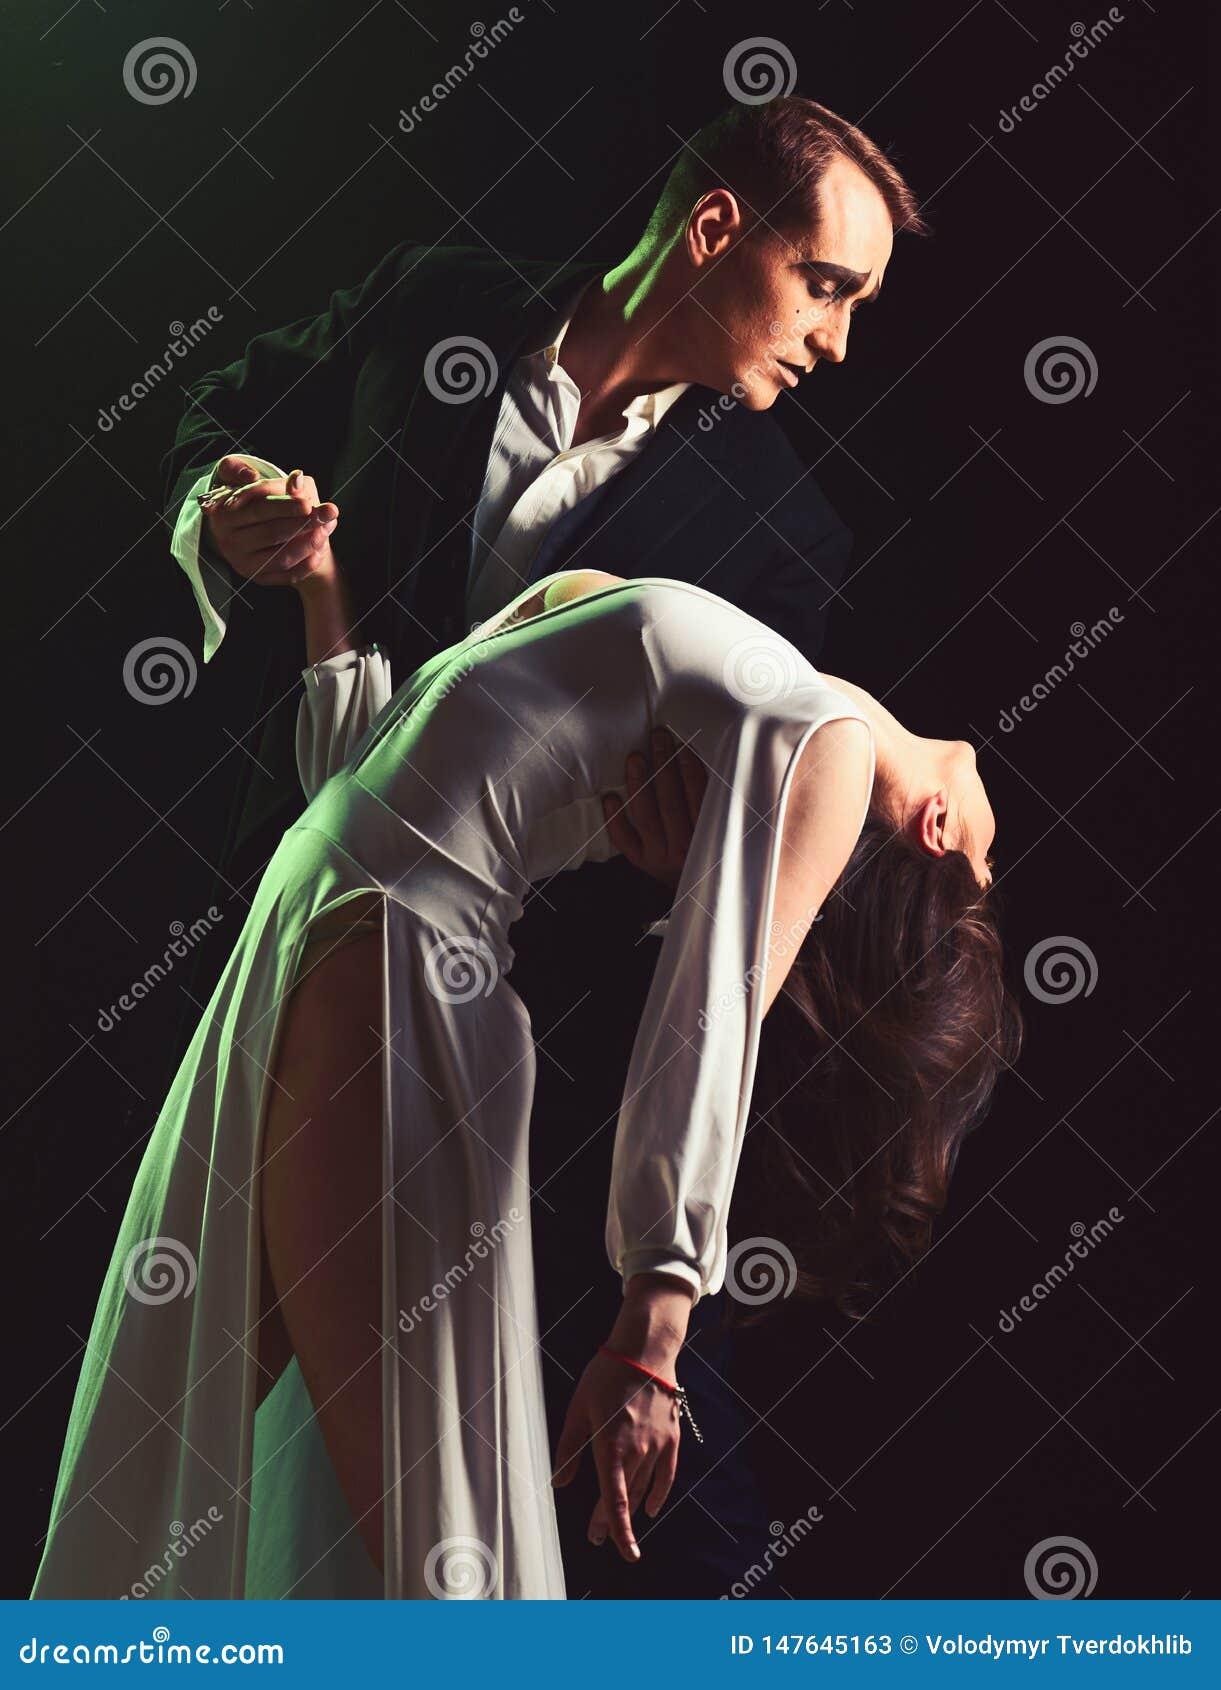 F?r m?nga sinnesr?relser farsman- och kvinnahandling i romantisk plats Par av farskonstn?rer utf?r romans p? etapp Par in